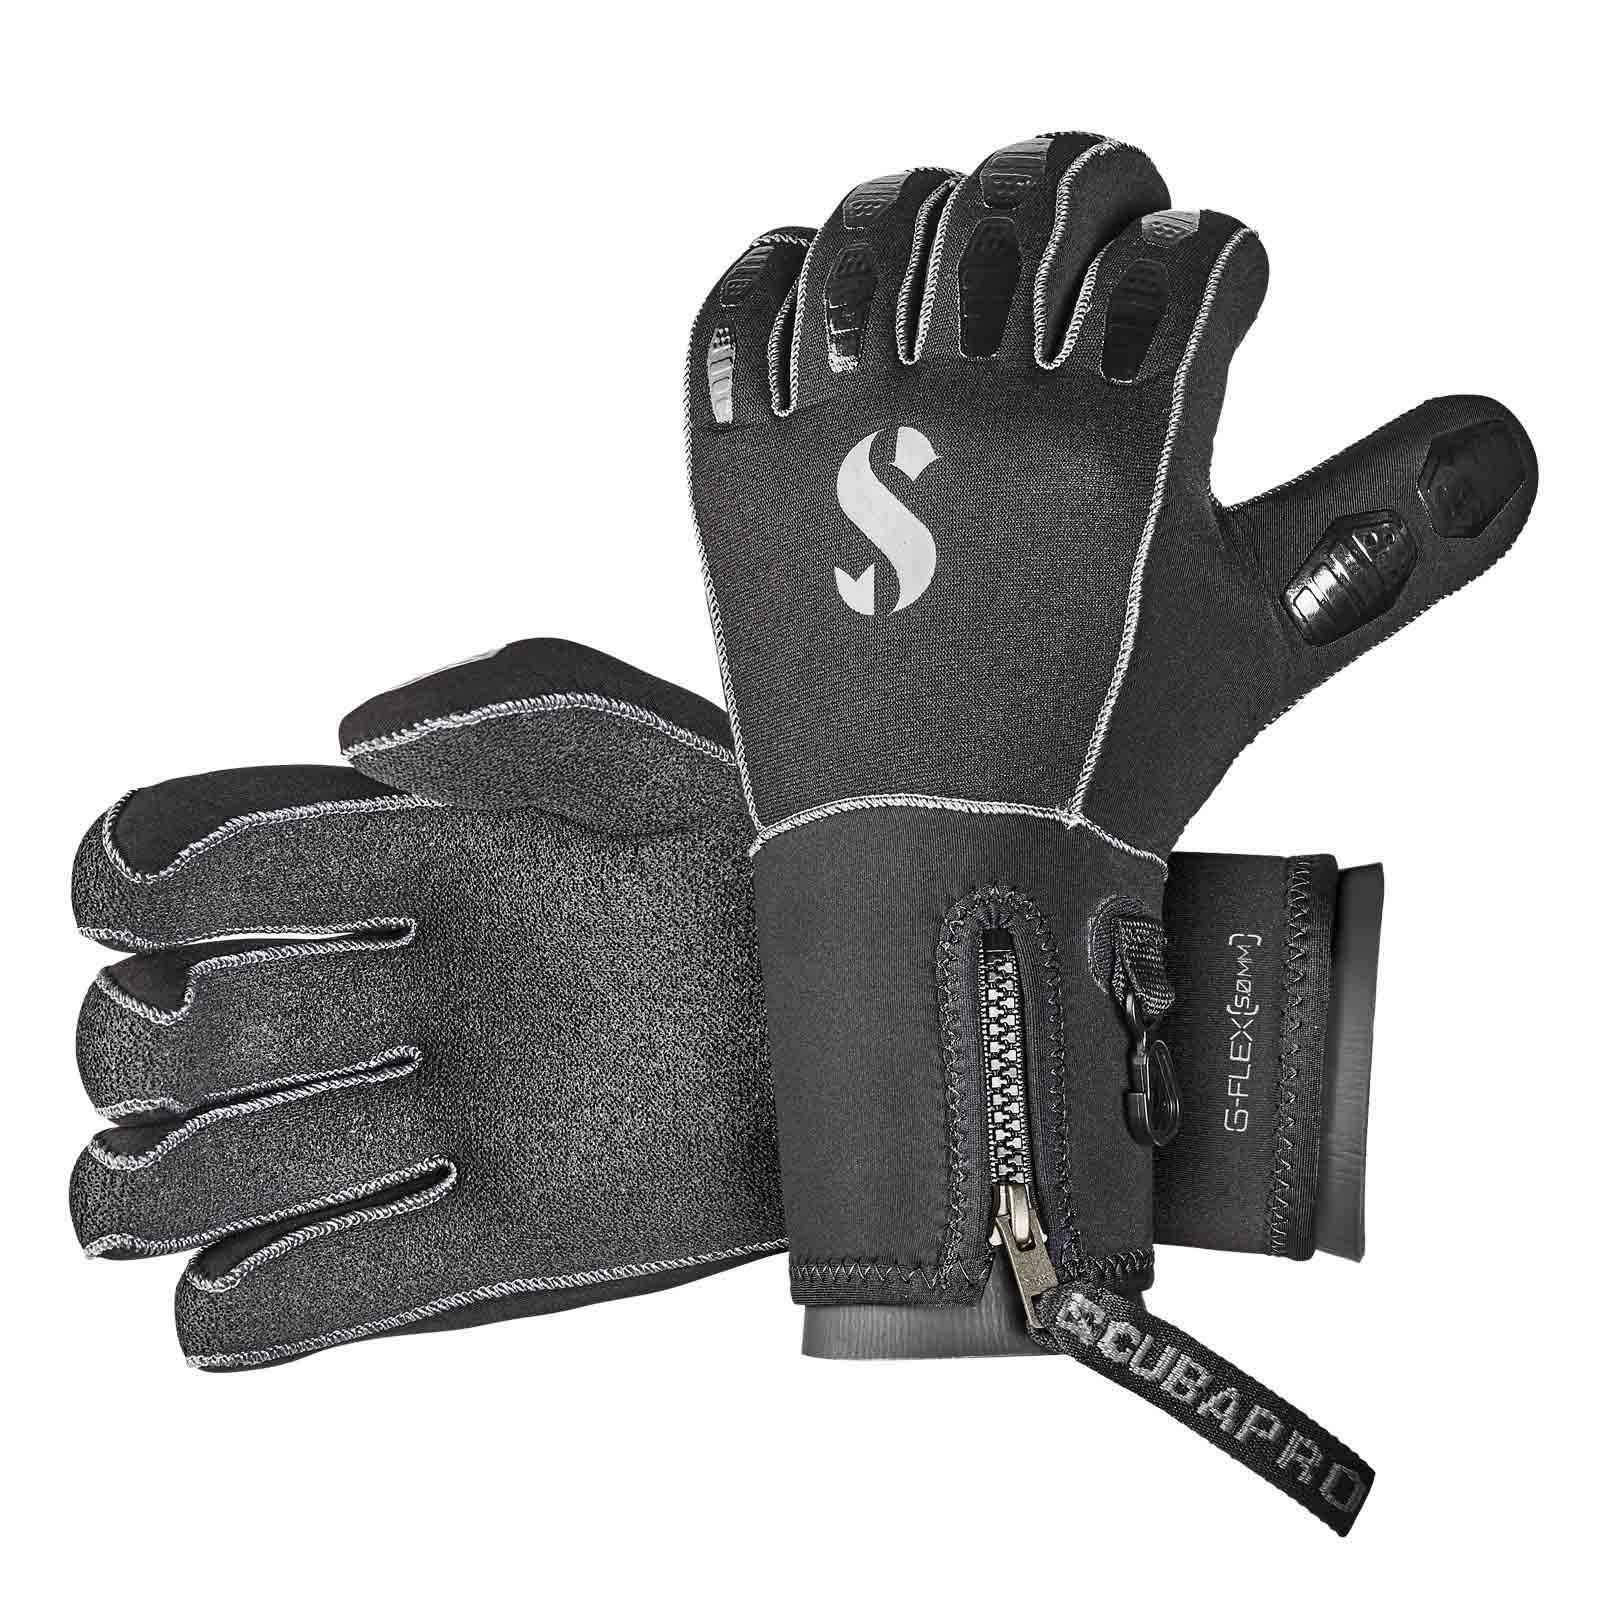 Scubapro G-Flex 5mm Tauchhandschuh Semi-Dry